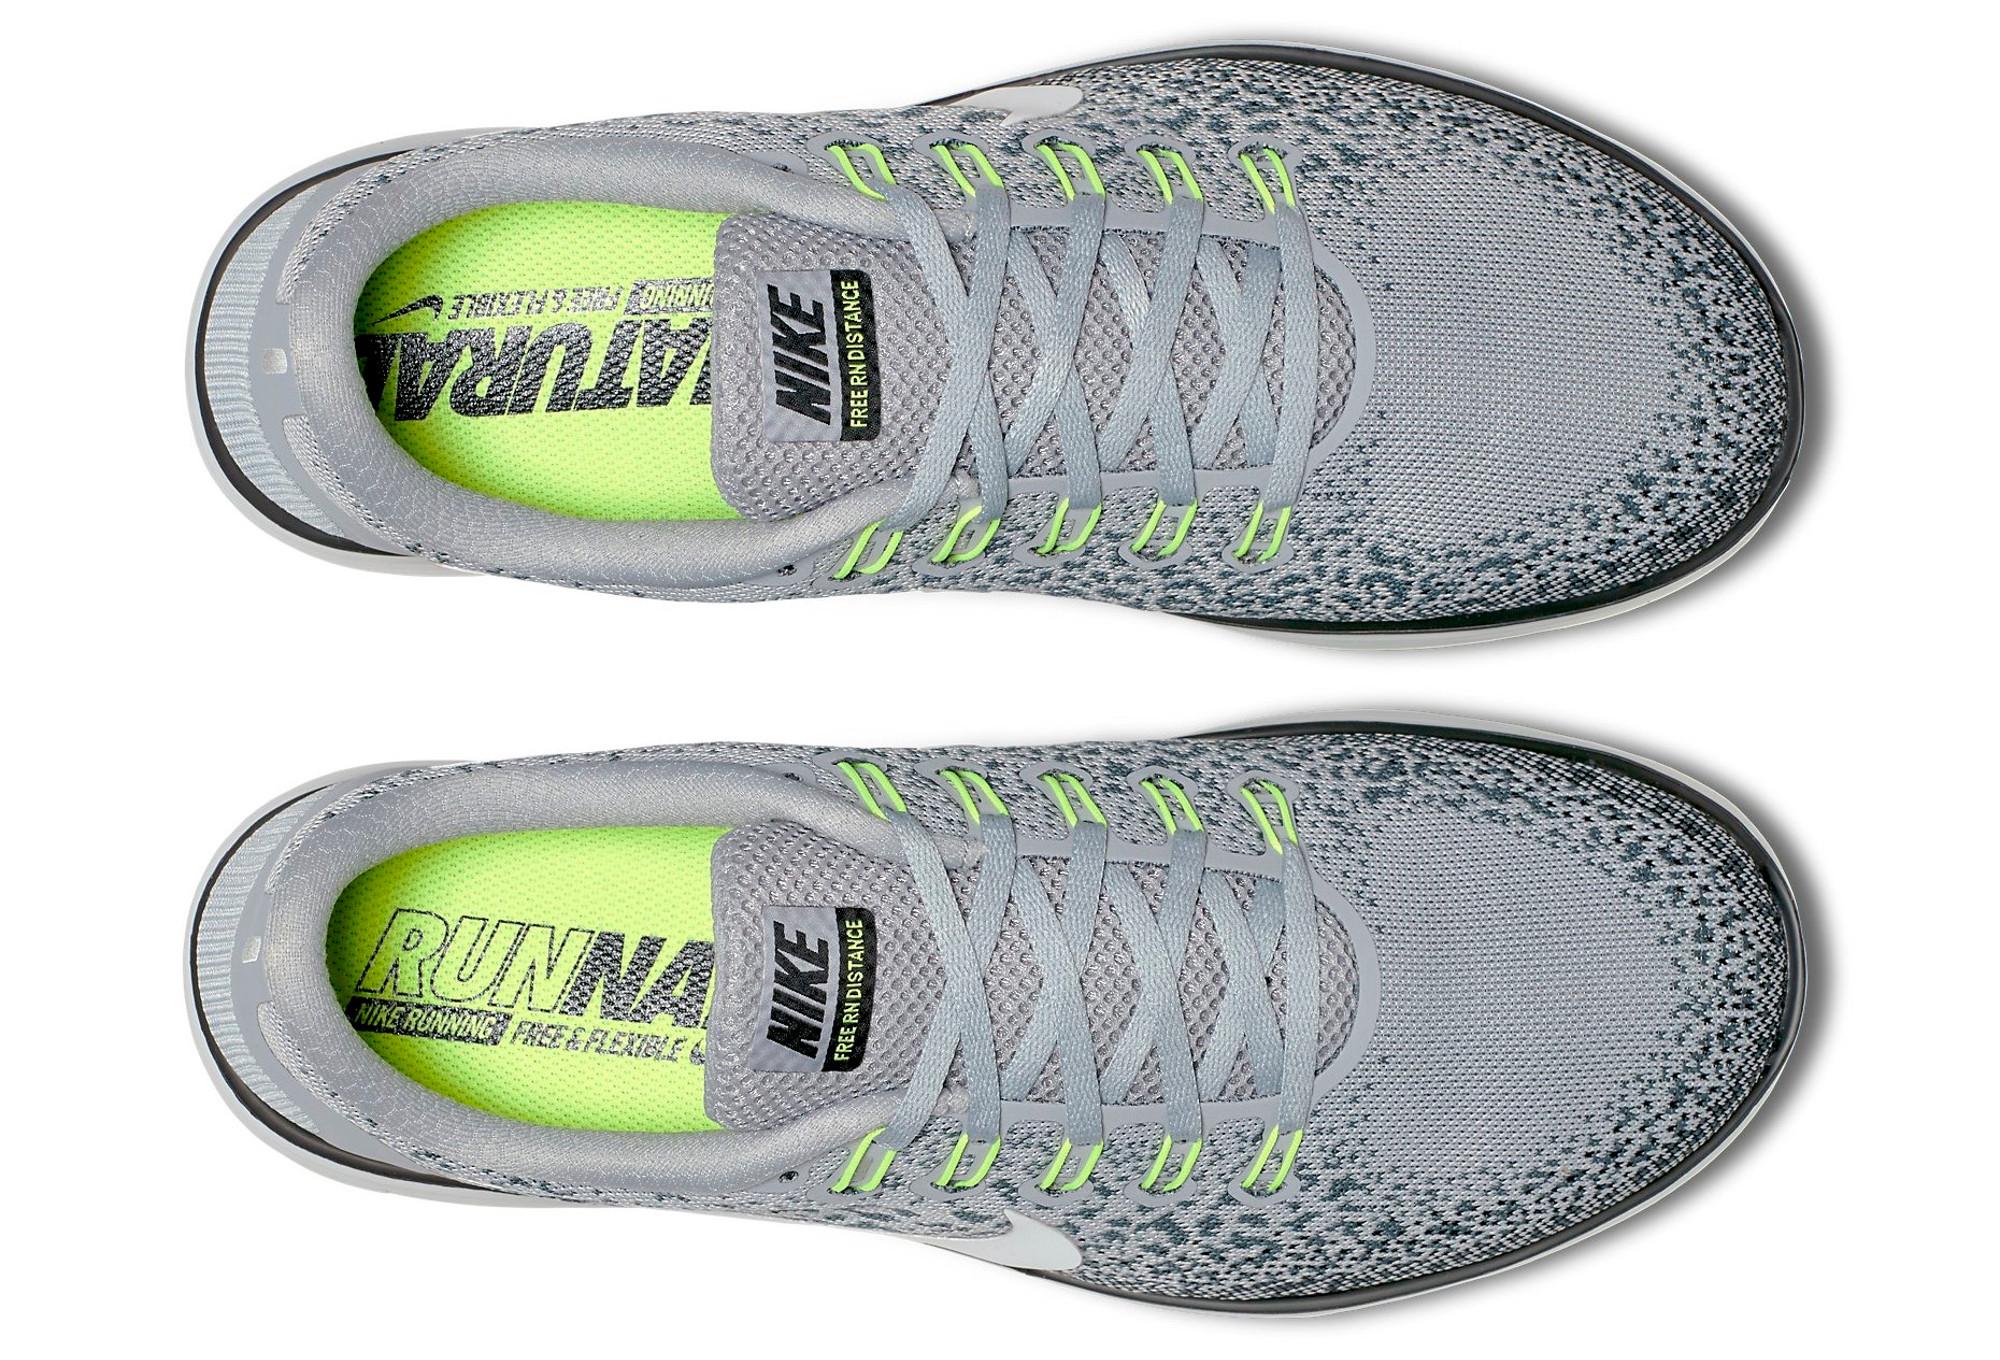 nouveau concept 0aae2 f532c Laufschuhe Nike FREE RUN DISTANCE Herren